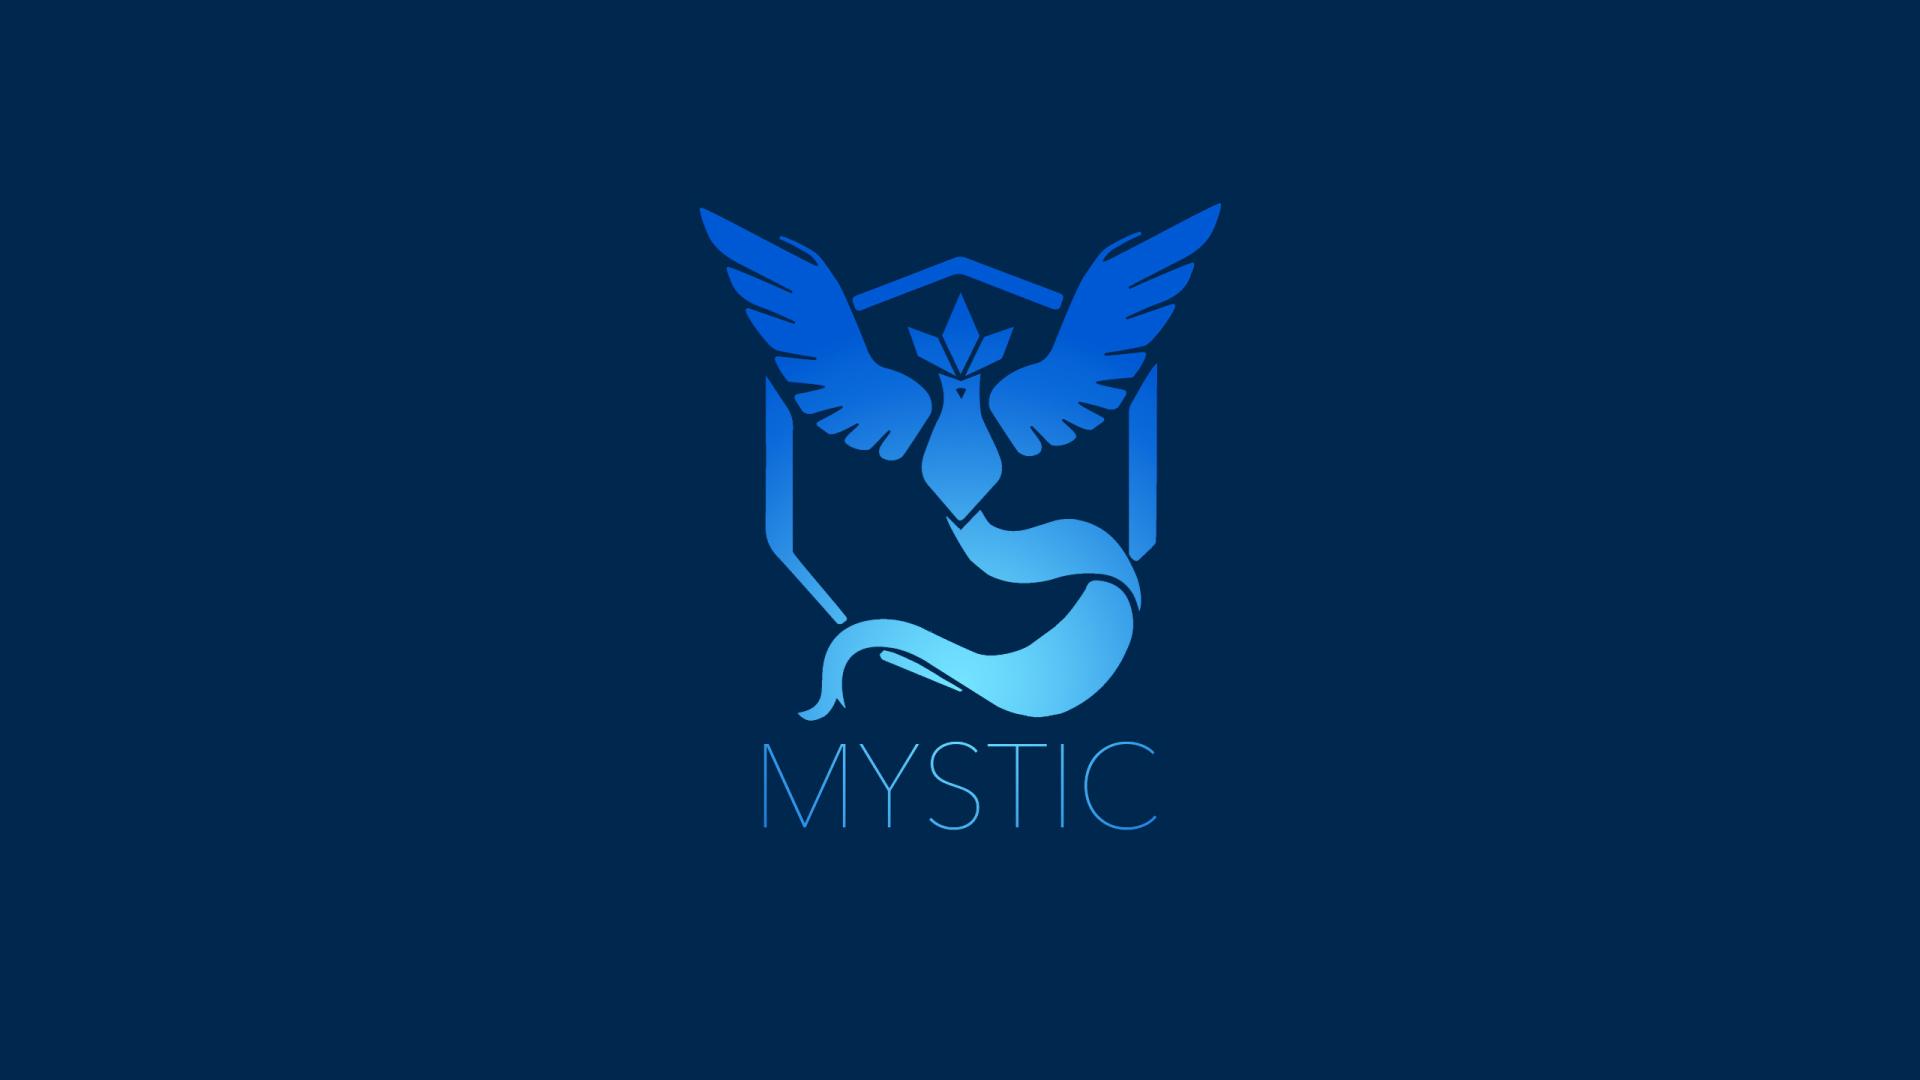 Video Game - Pokemon GO  Team Mystic Wallpaper